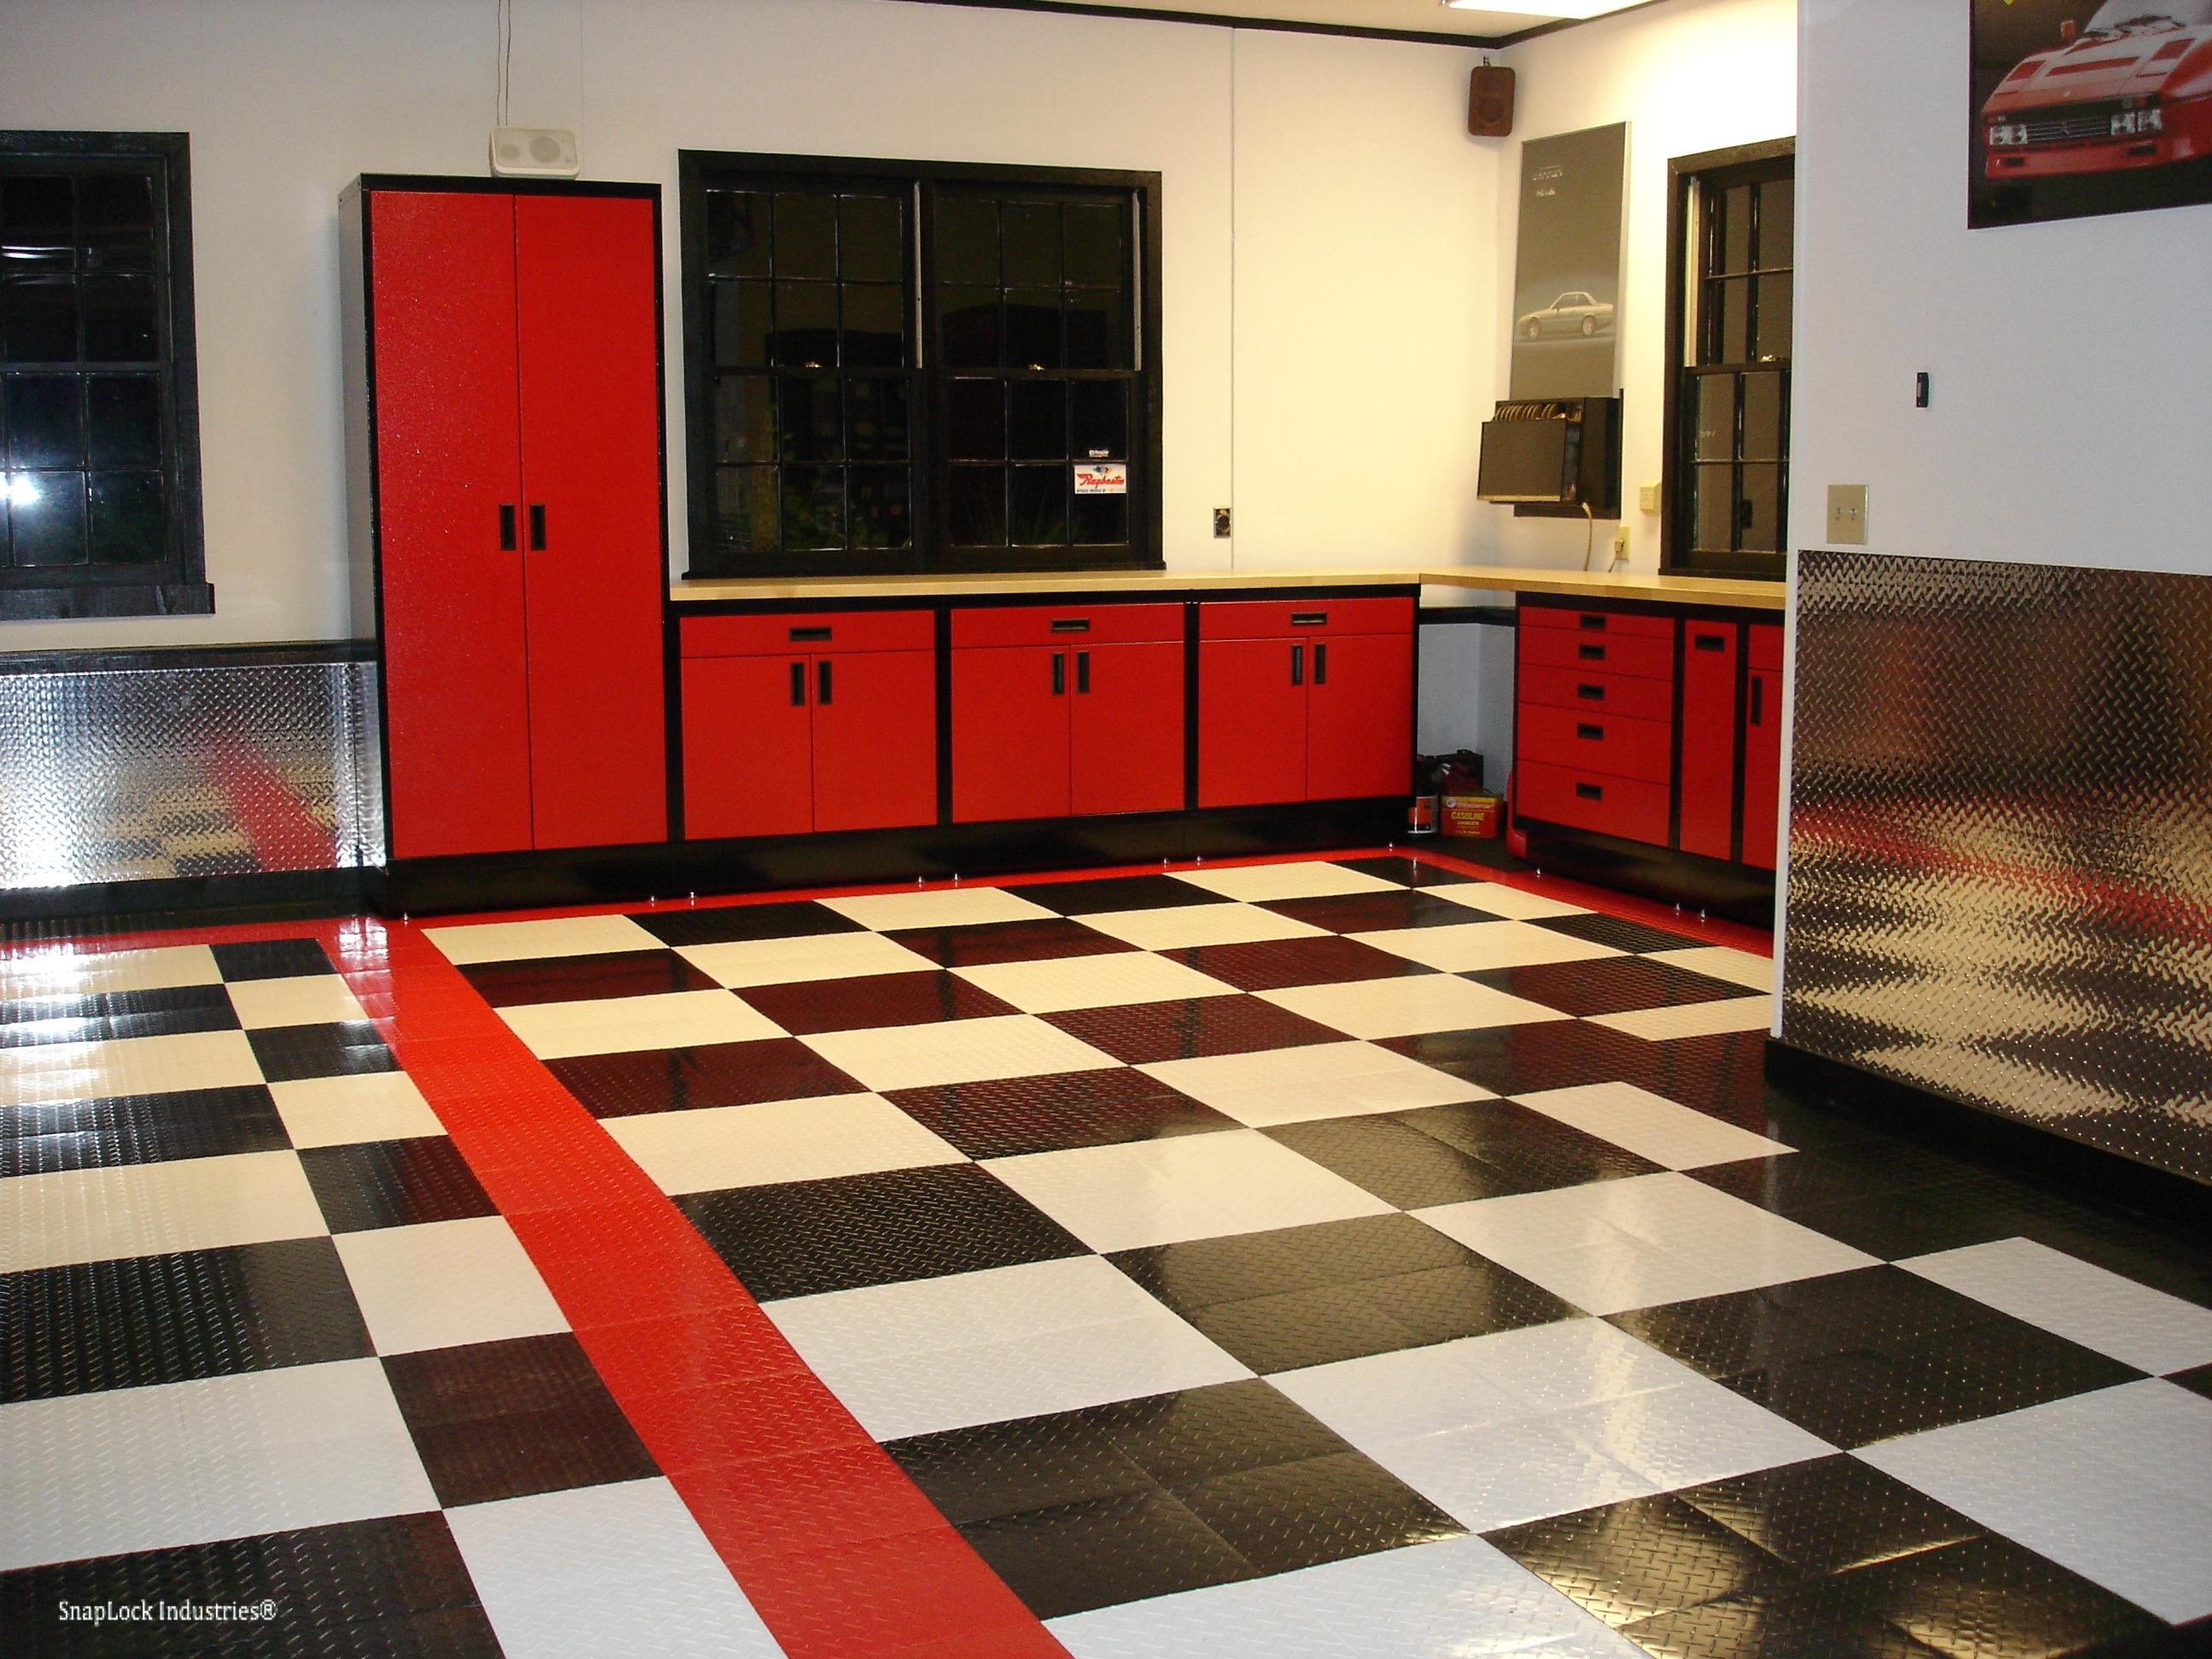 Harley color carpet tiles - Racedeck Tuffshield Interlocking Garage Tile Floor Mat Garage Tiles Racedeck Tuffshield Interlocking Garage Tile Mat